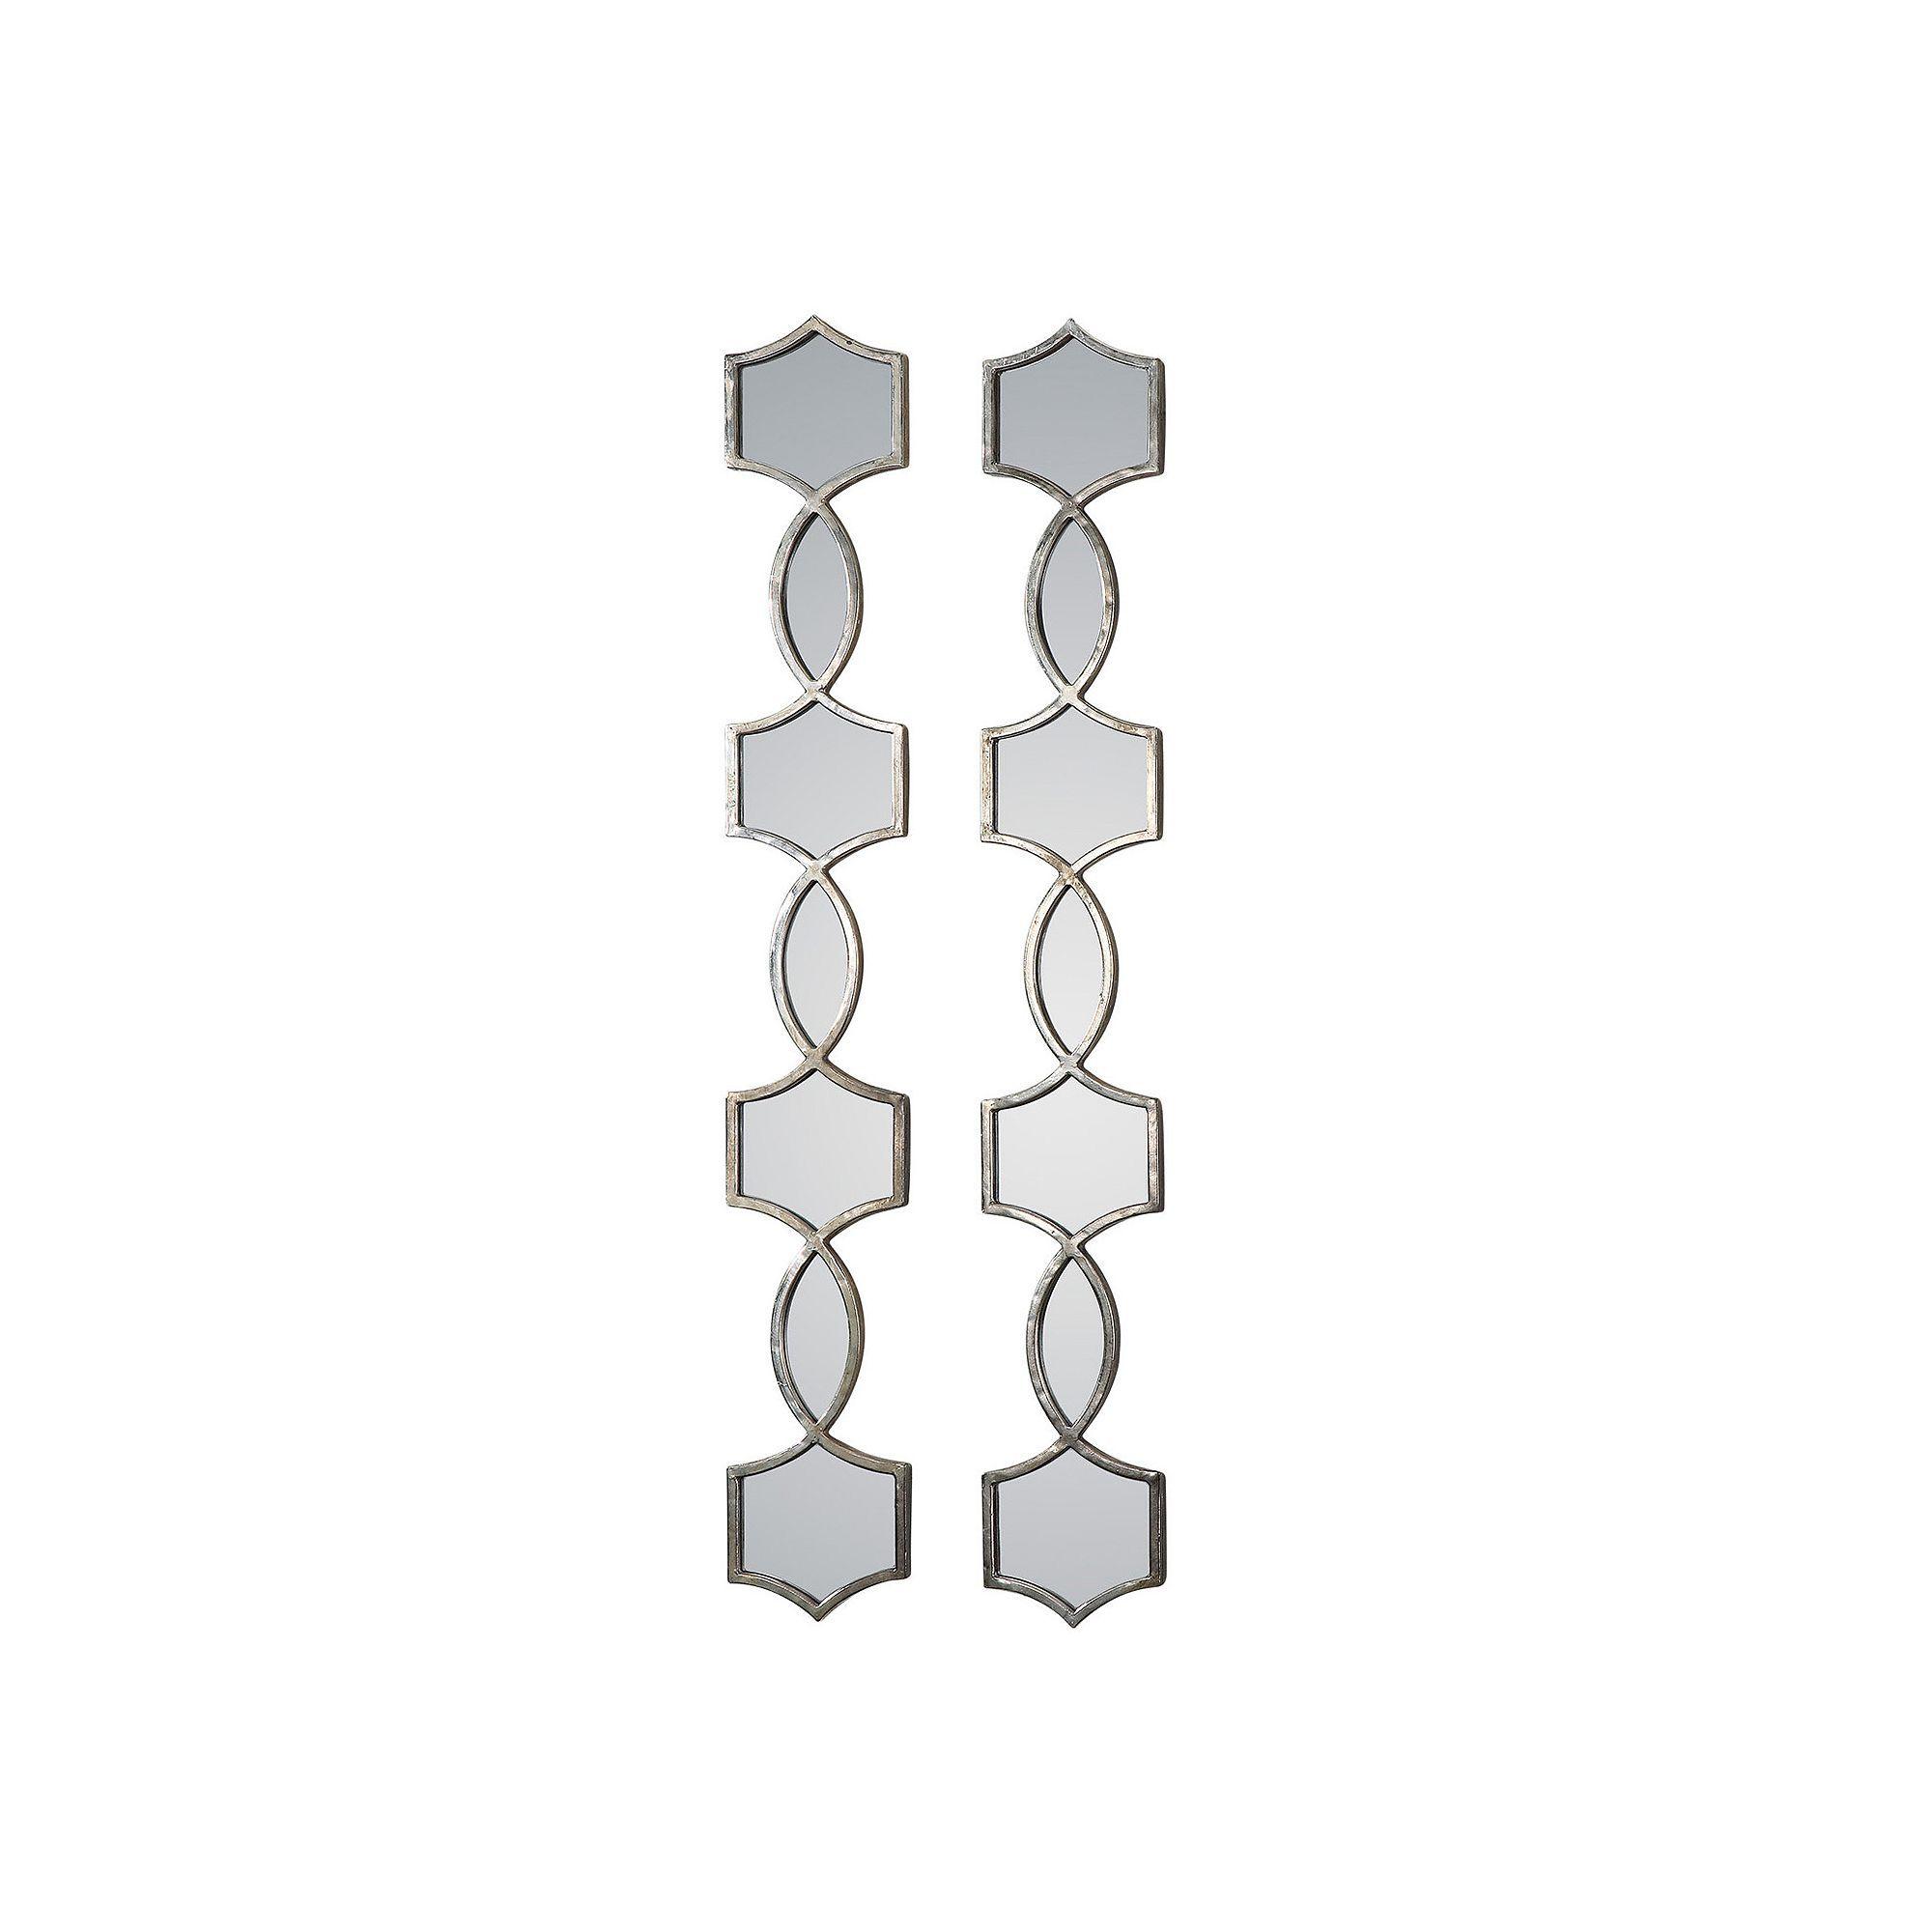 Vinzela 2 Piece Metal Wall Mirror Set